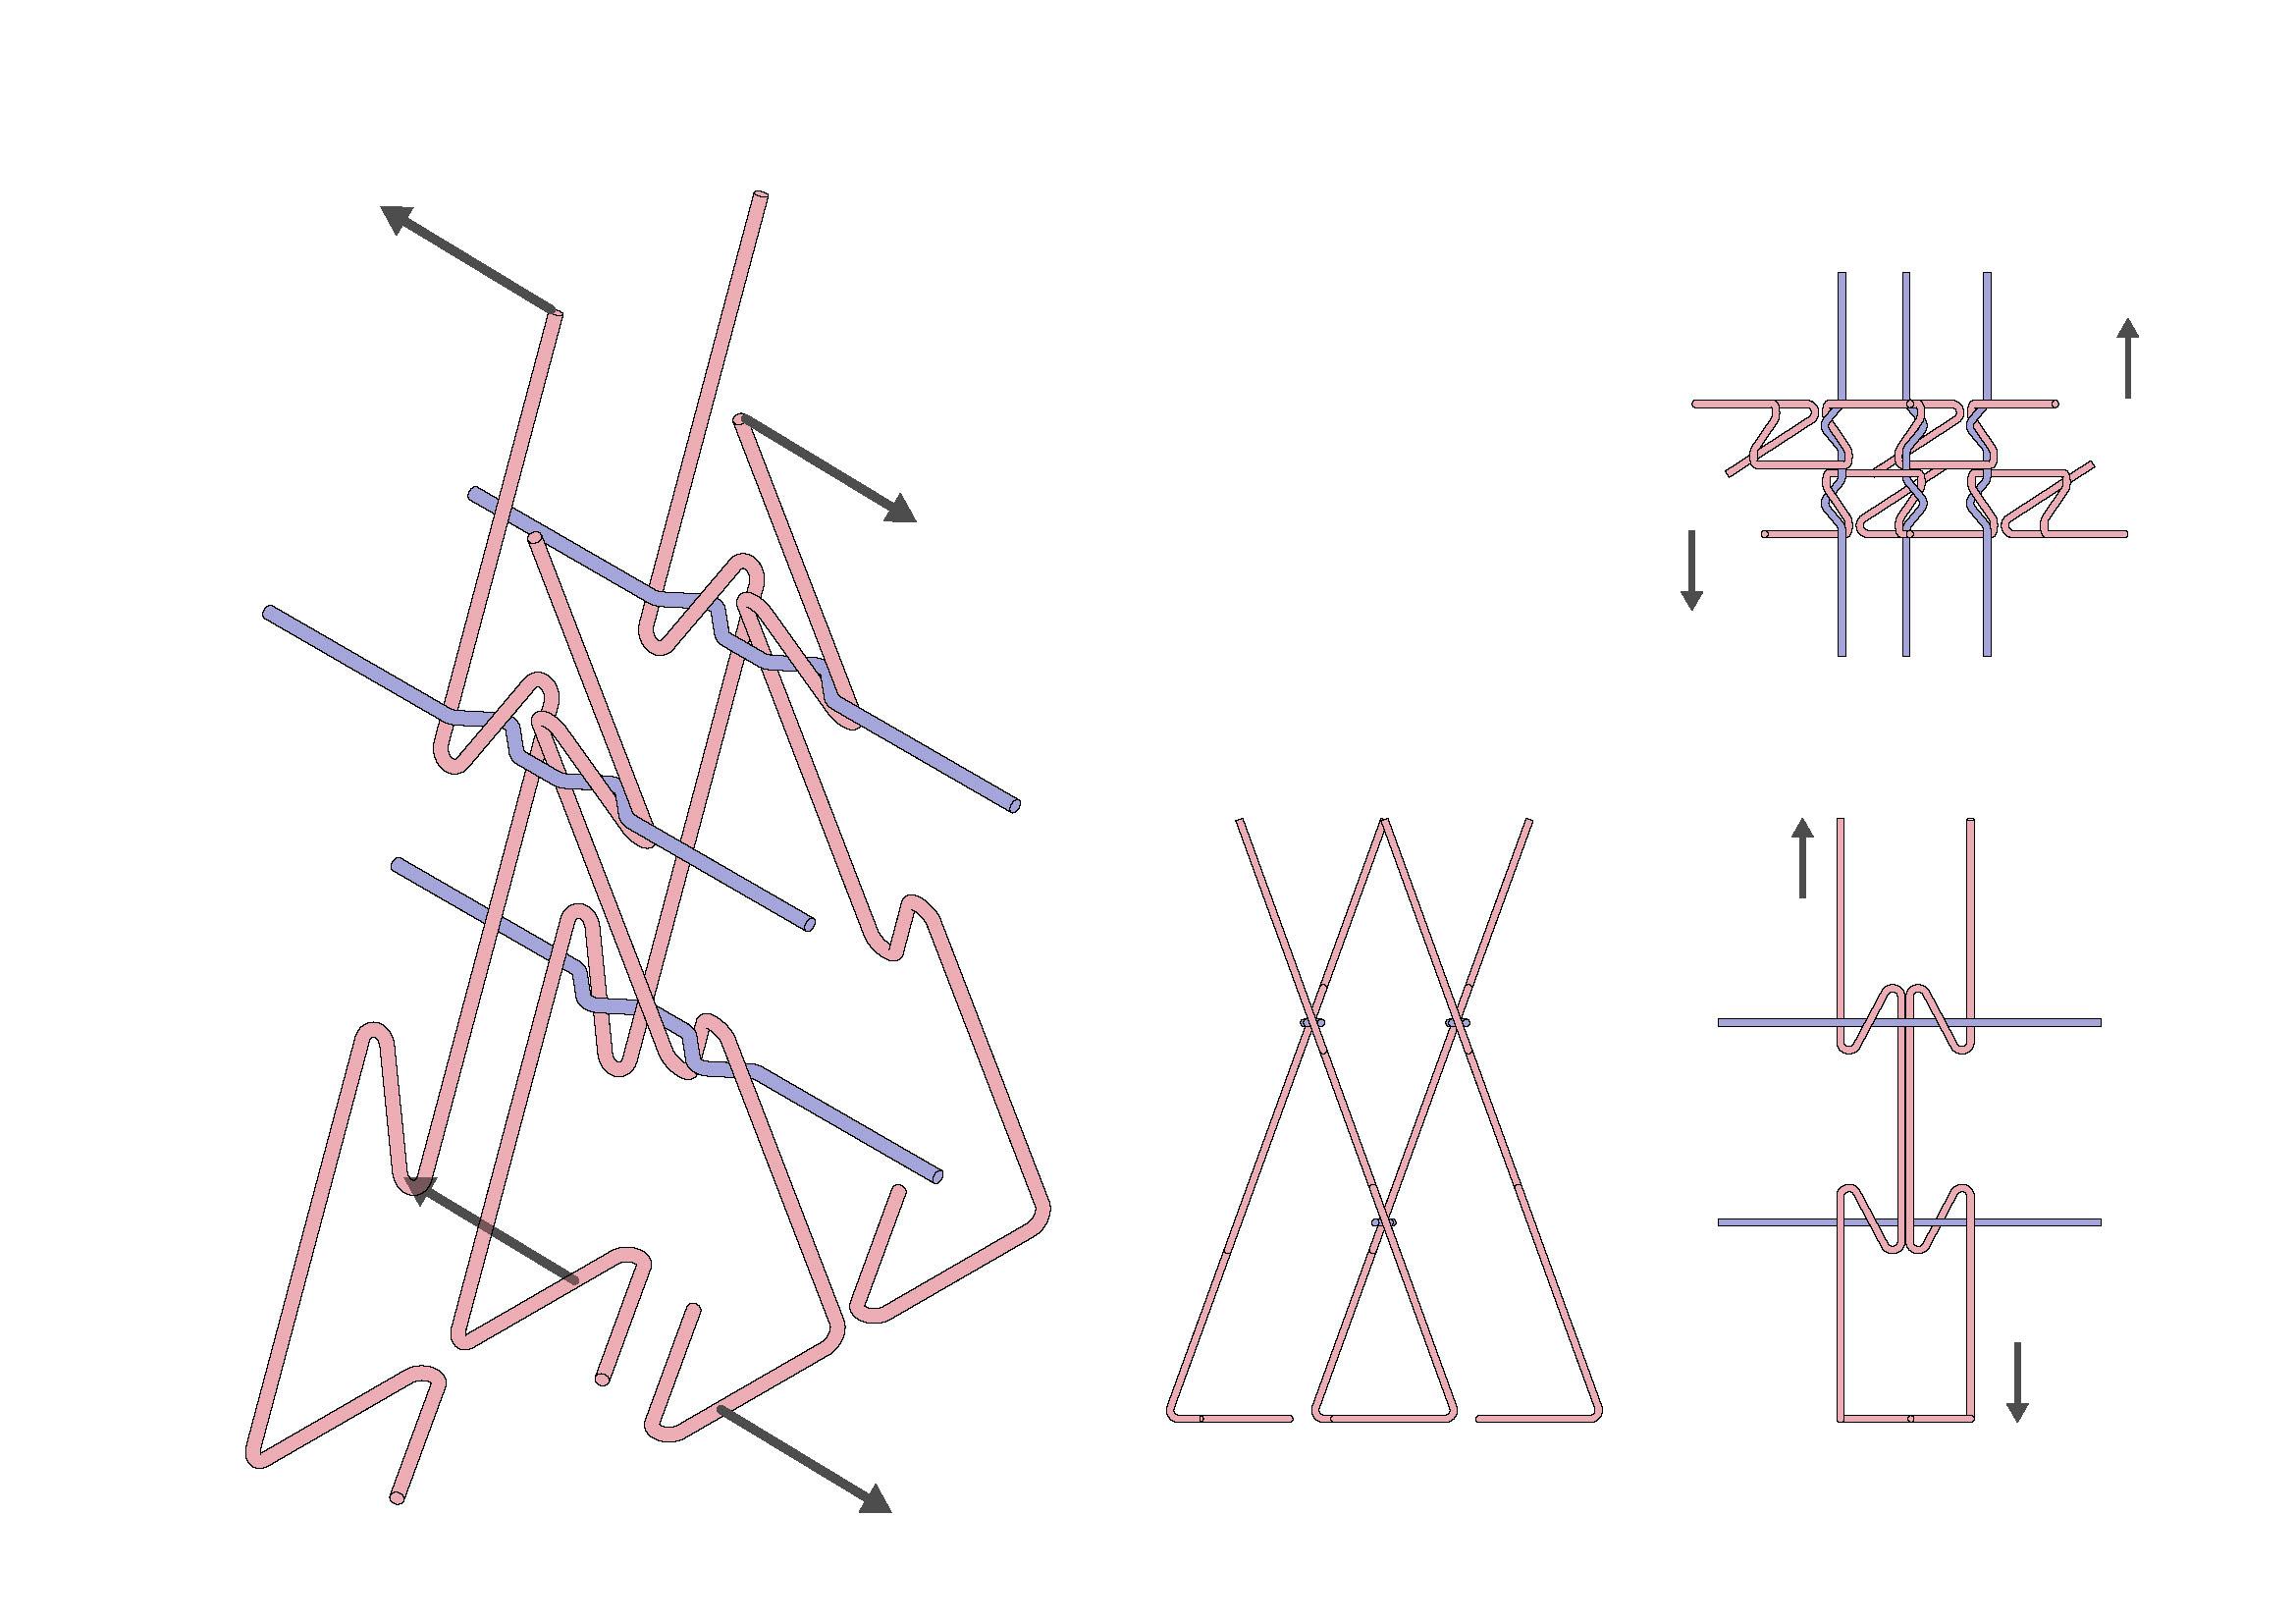 force diagram_for slides (1) 3.jpg